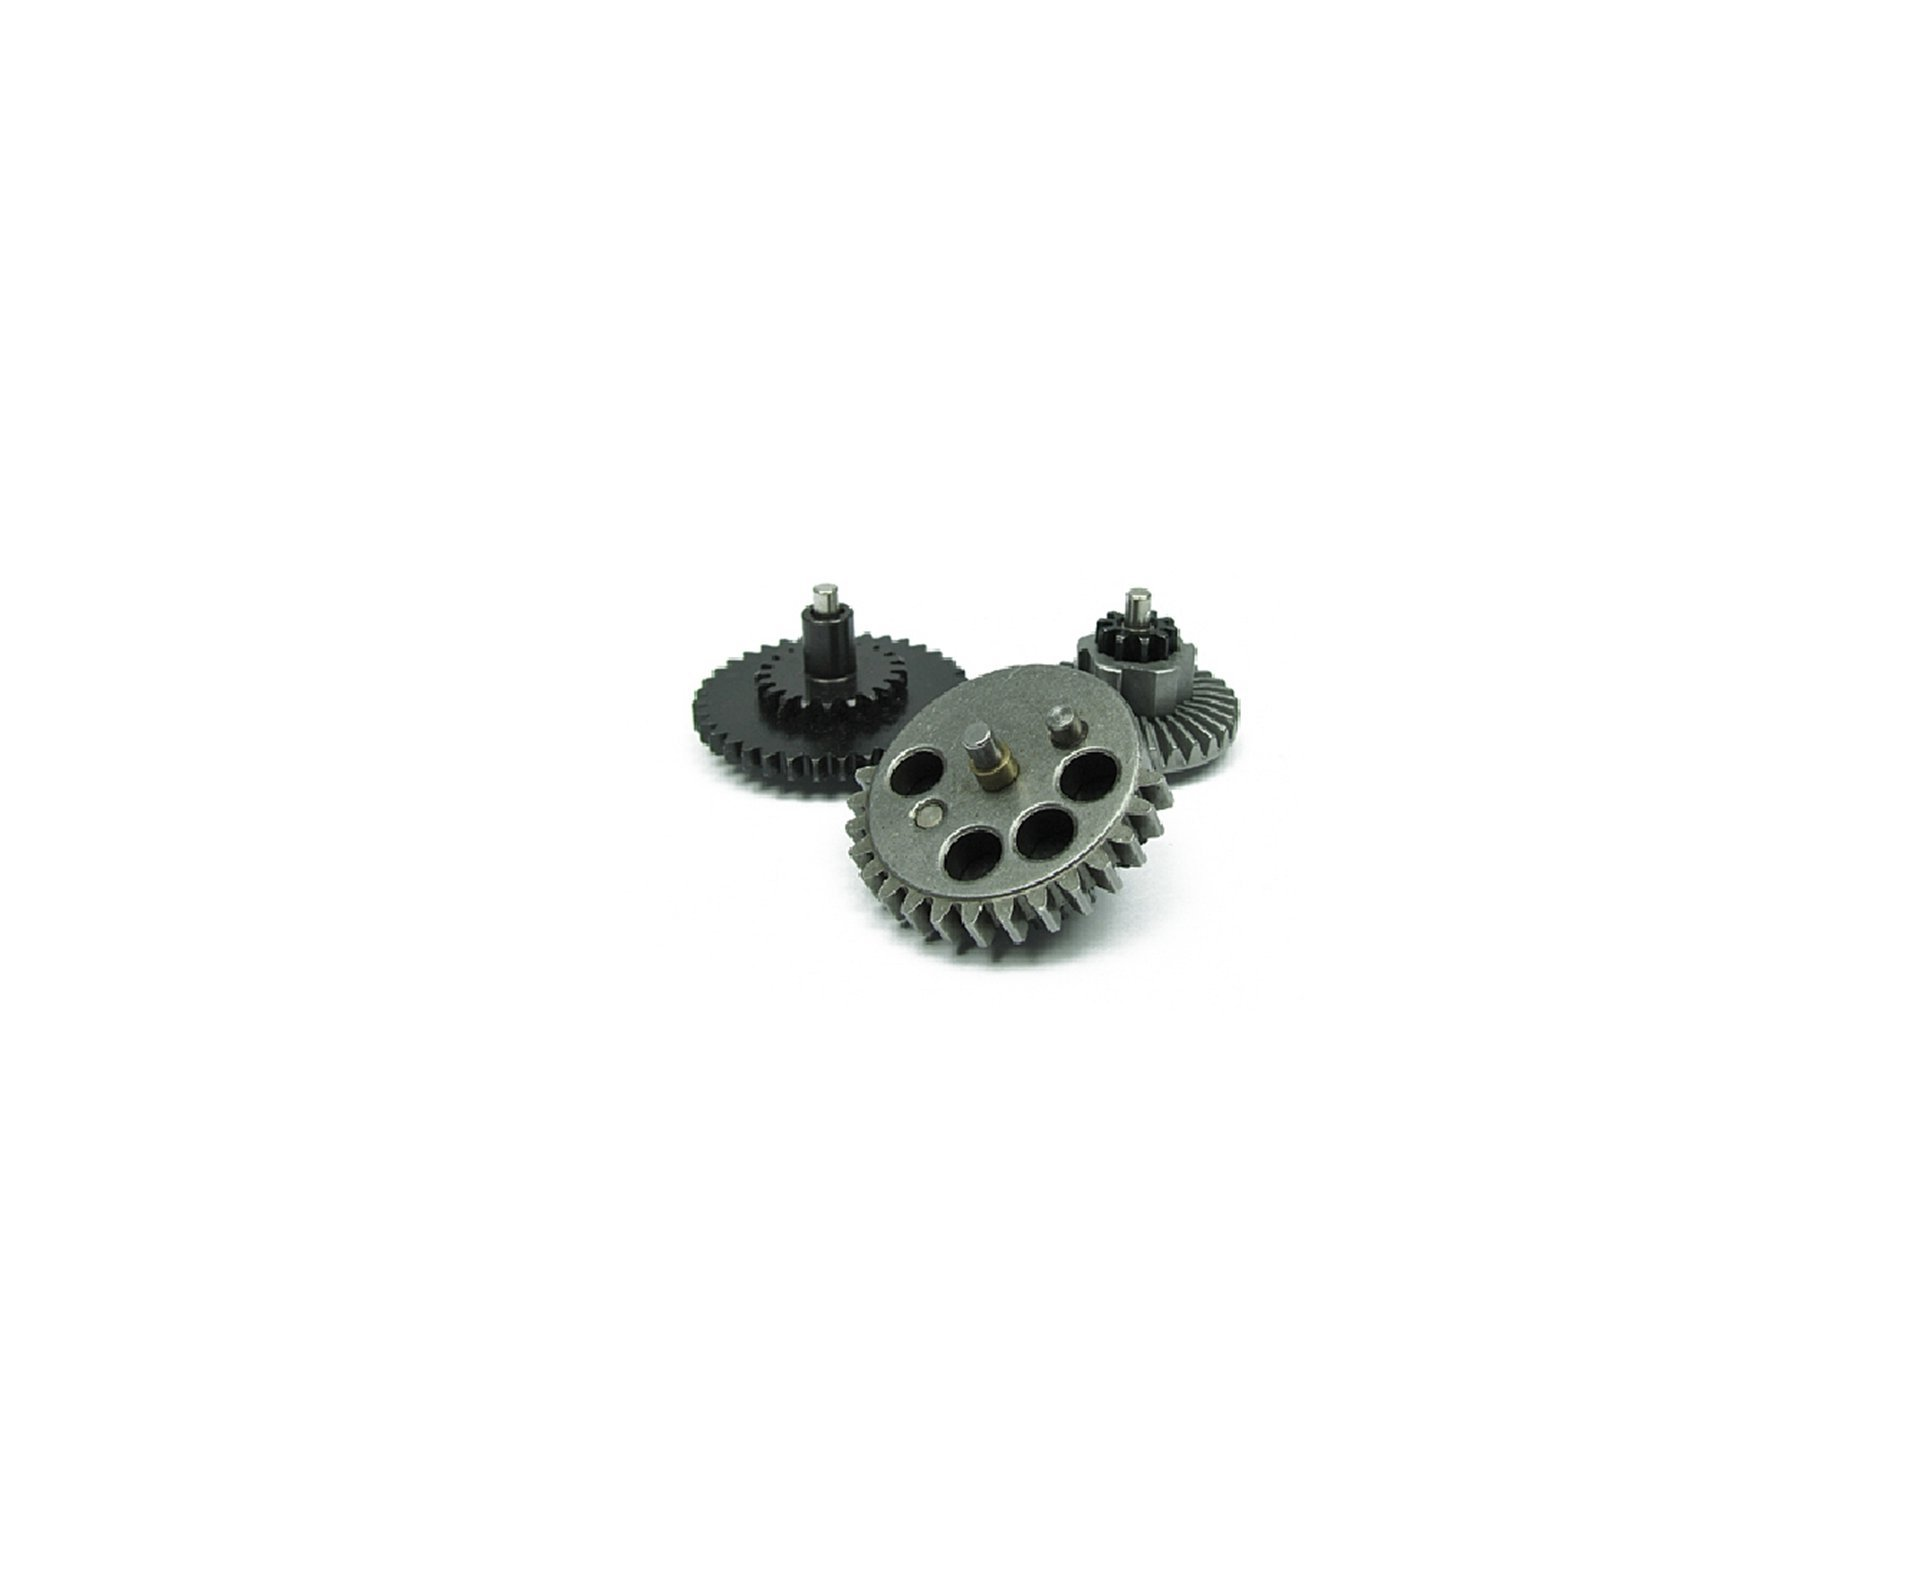 Conjunto De Engrenagens Alta Velocidade Gear Set - King Arms